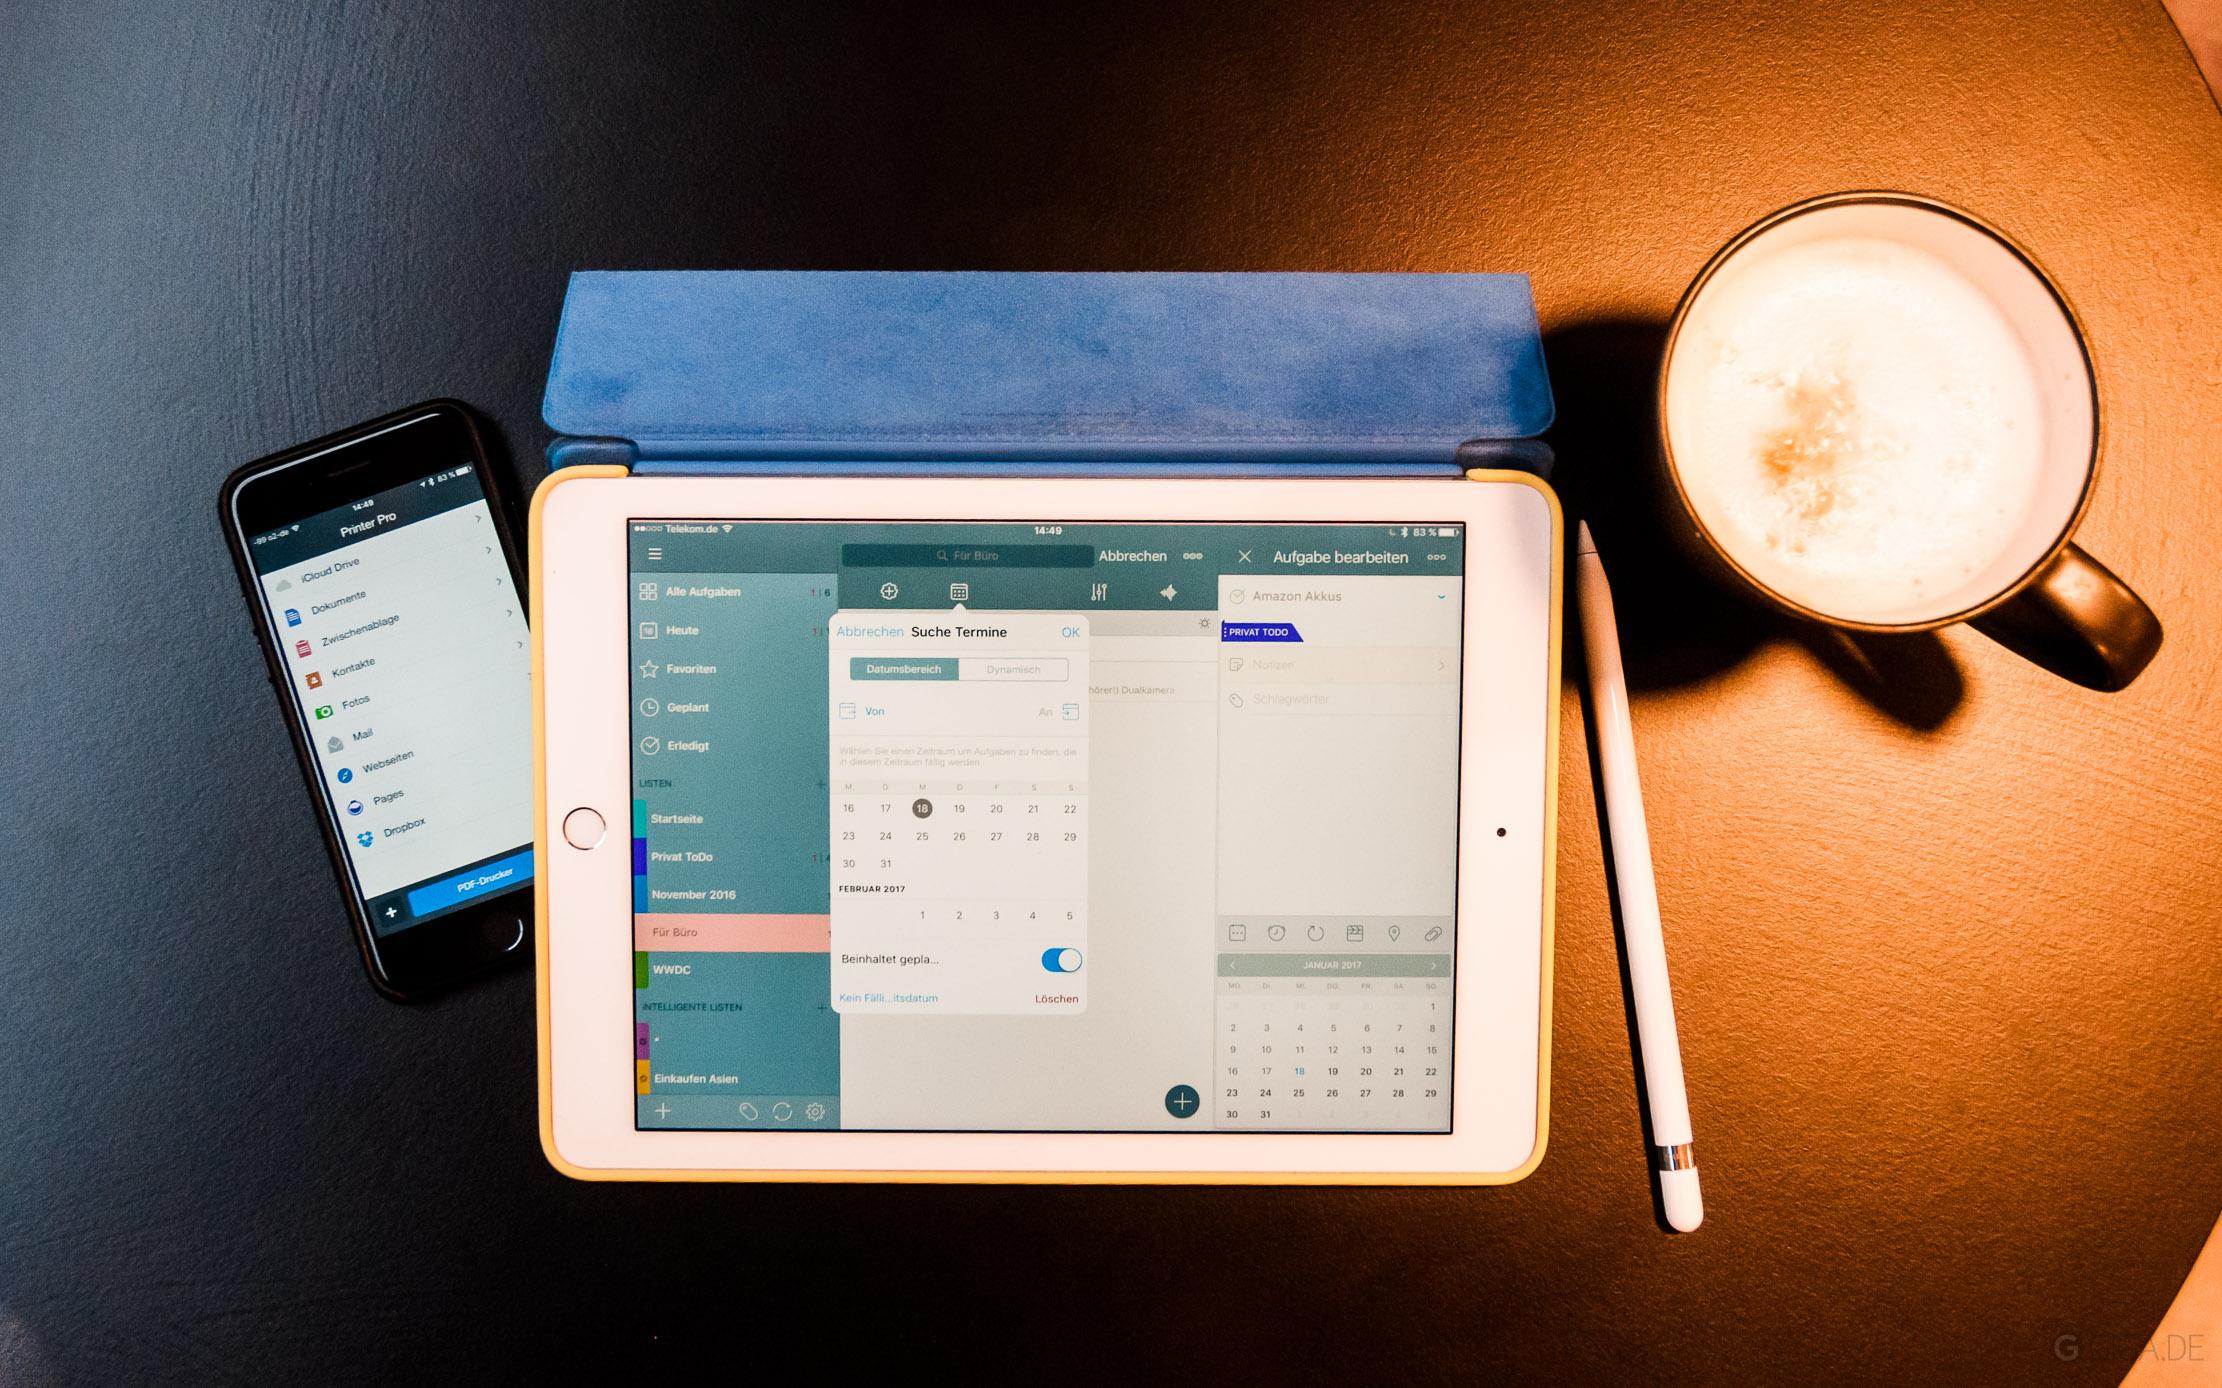 Nützliche Produktivitäts-Apps